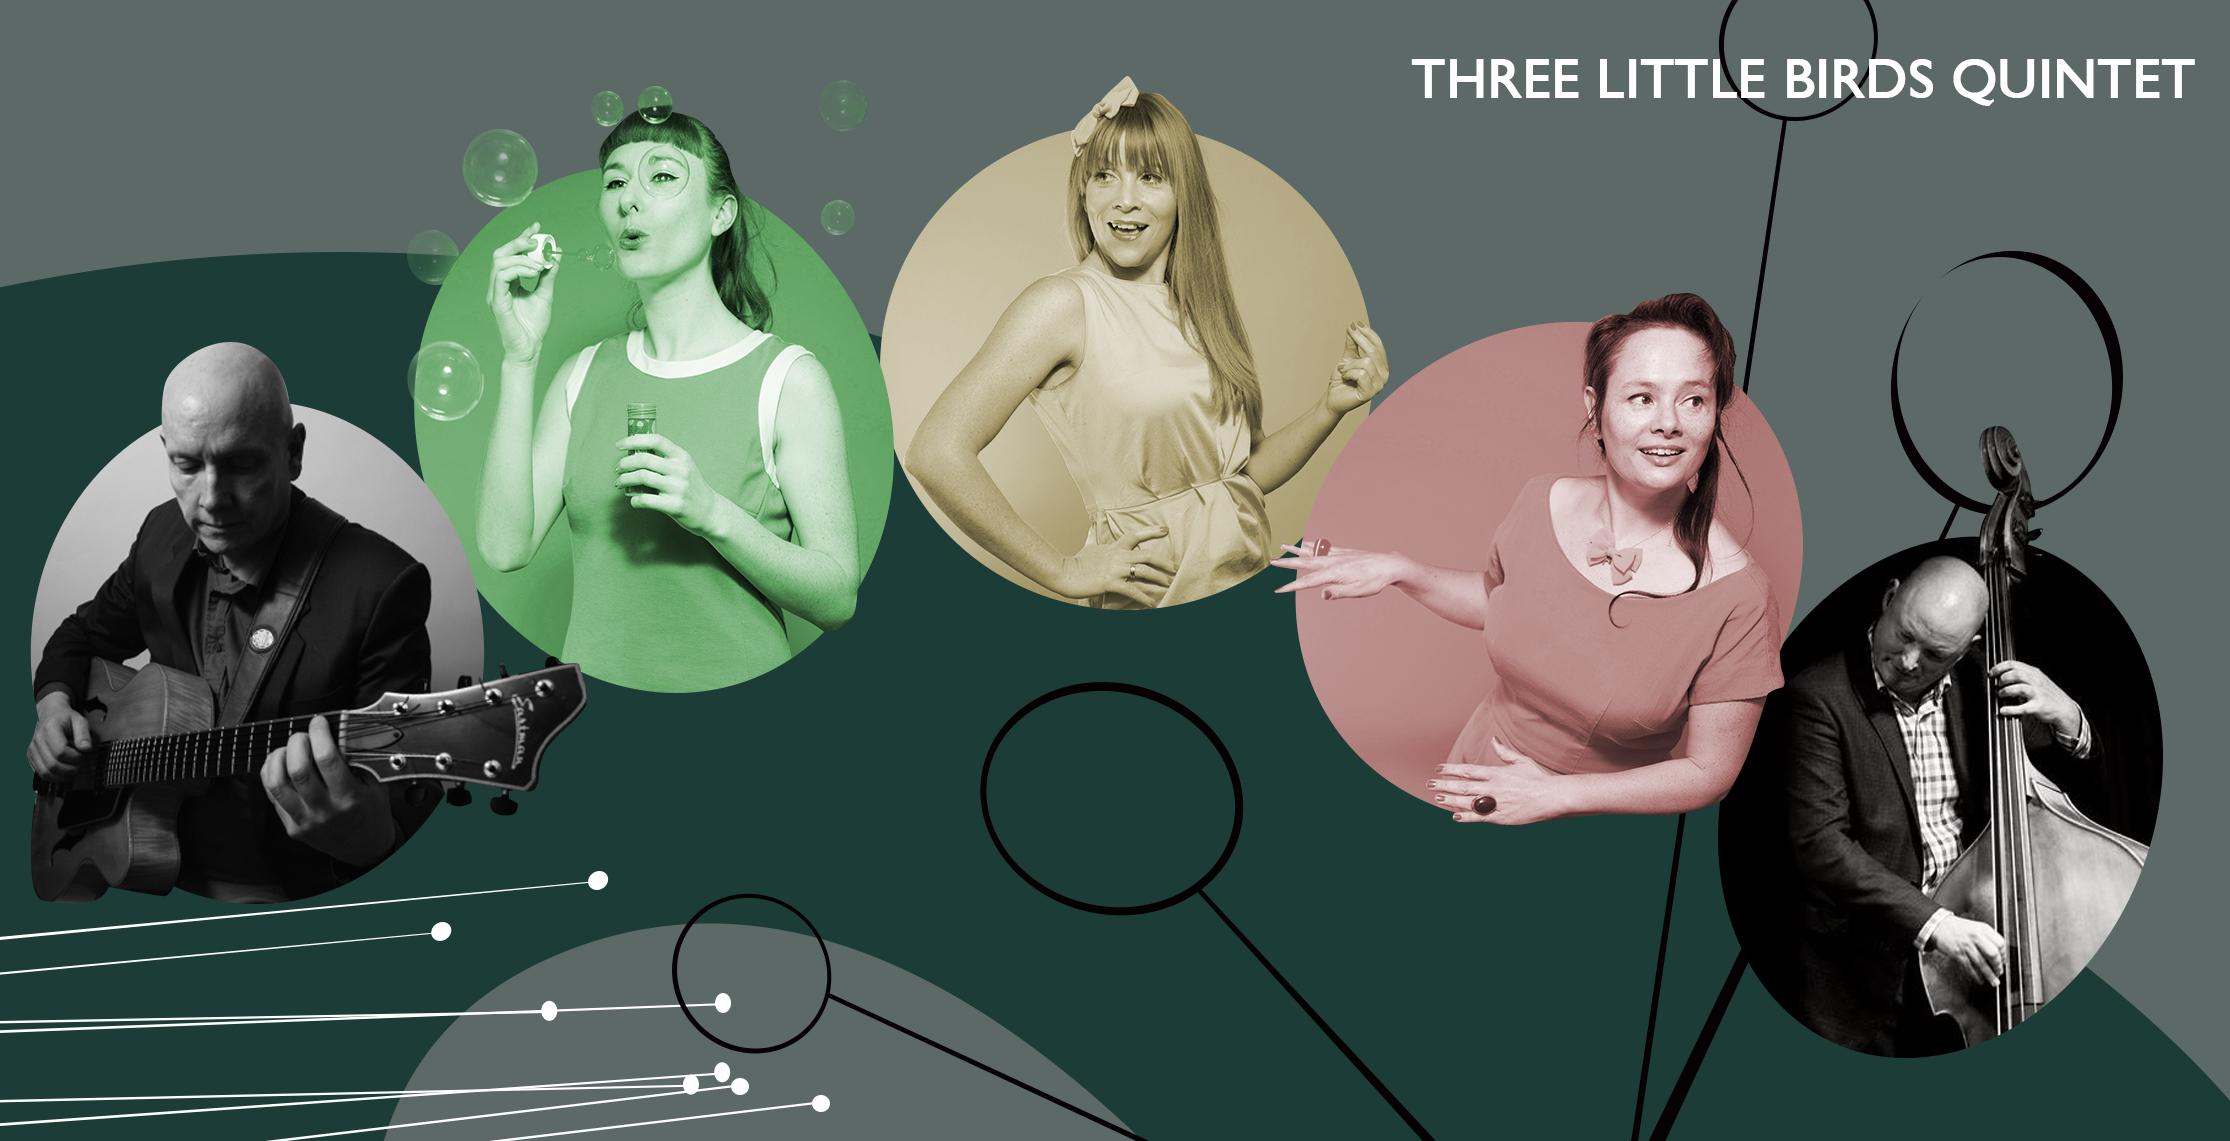 Three Little Birds Quintet